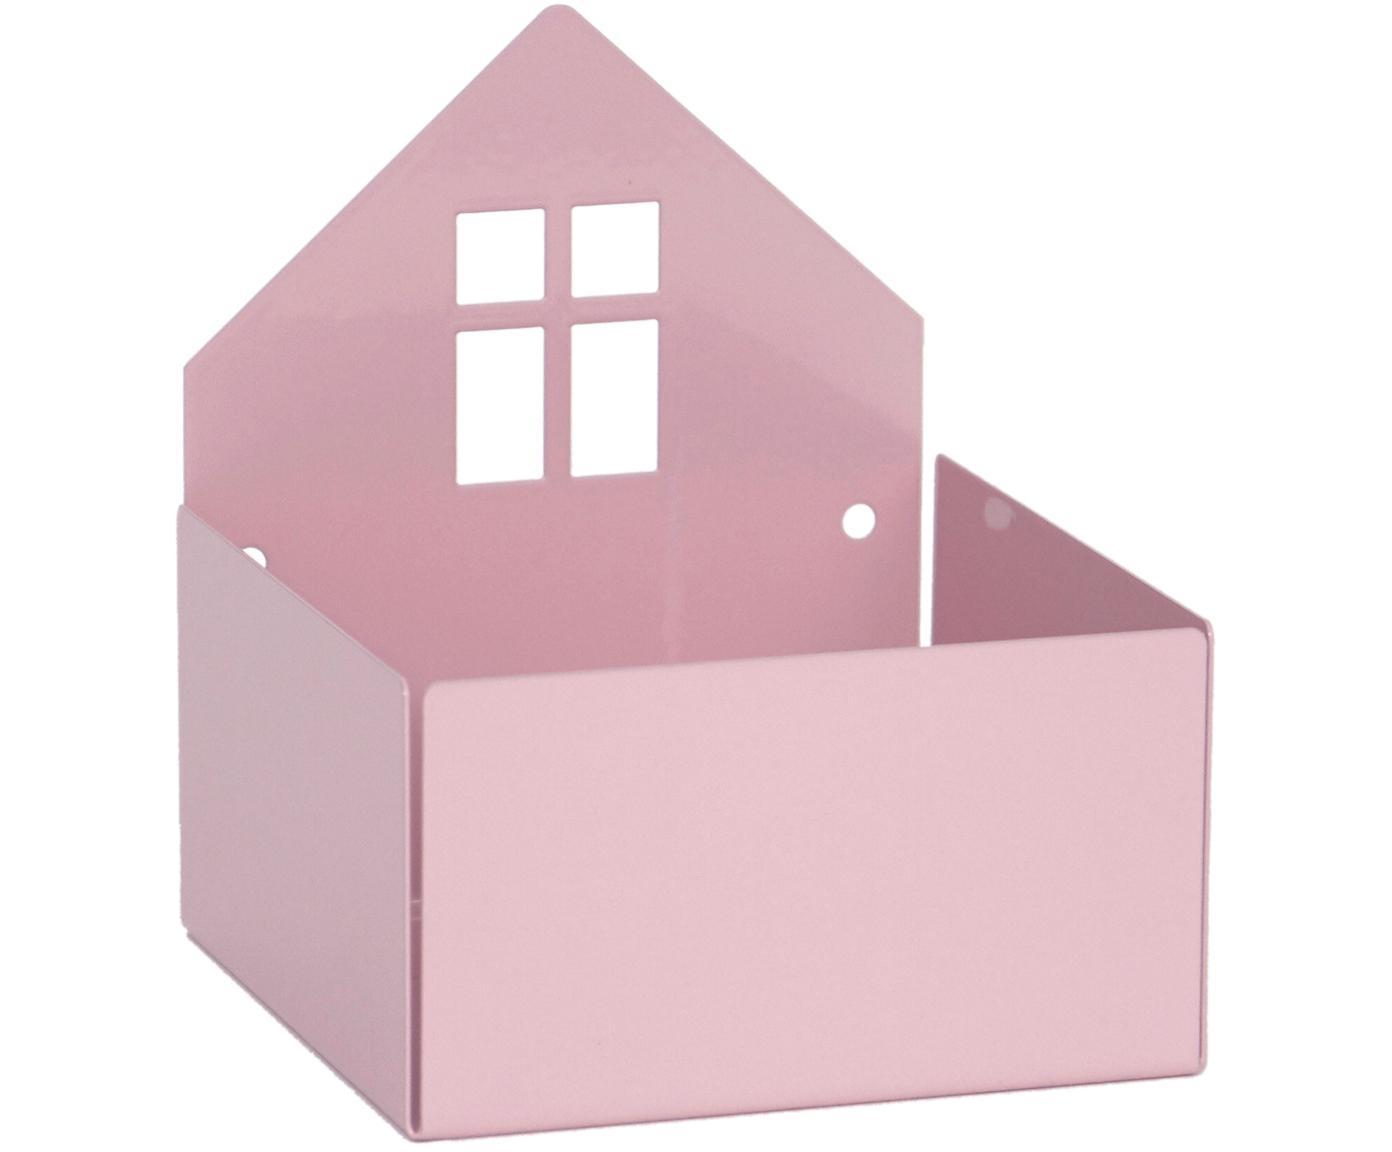 Scatola Town House, Metallo verniciato a polvere, Rosa, Larg. 11 x Alt. 13 cm